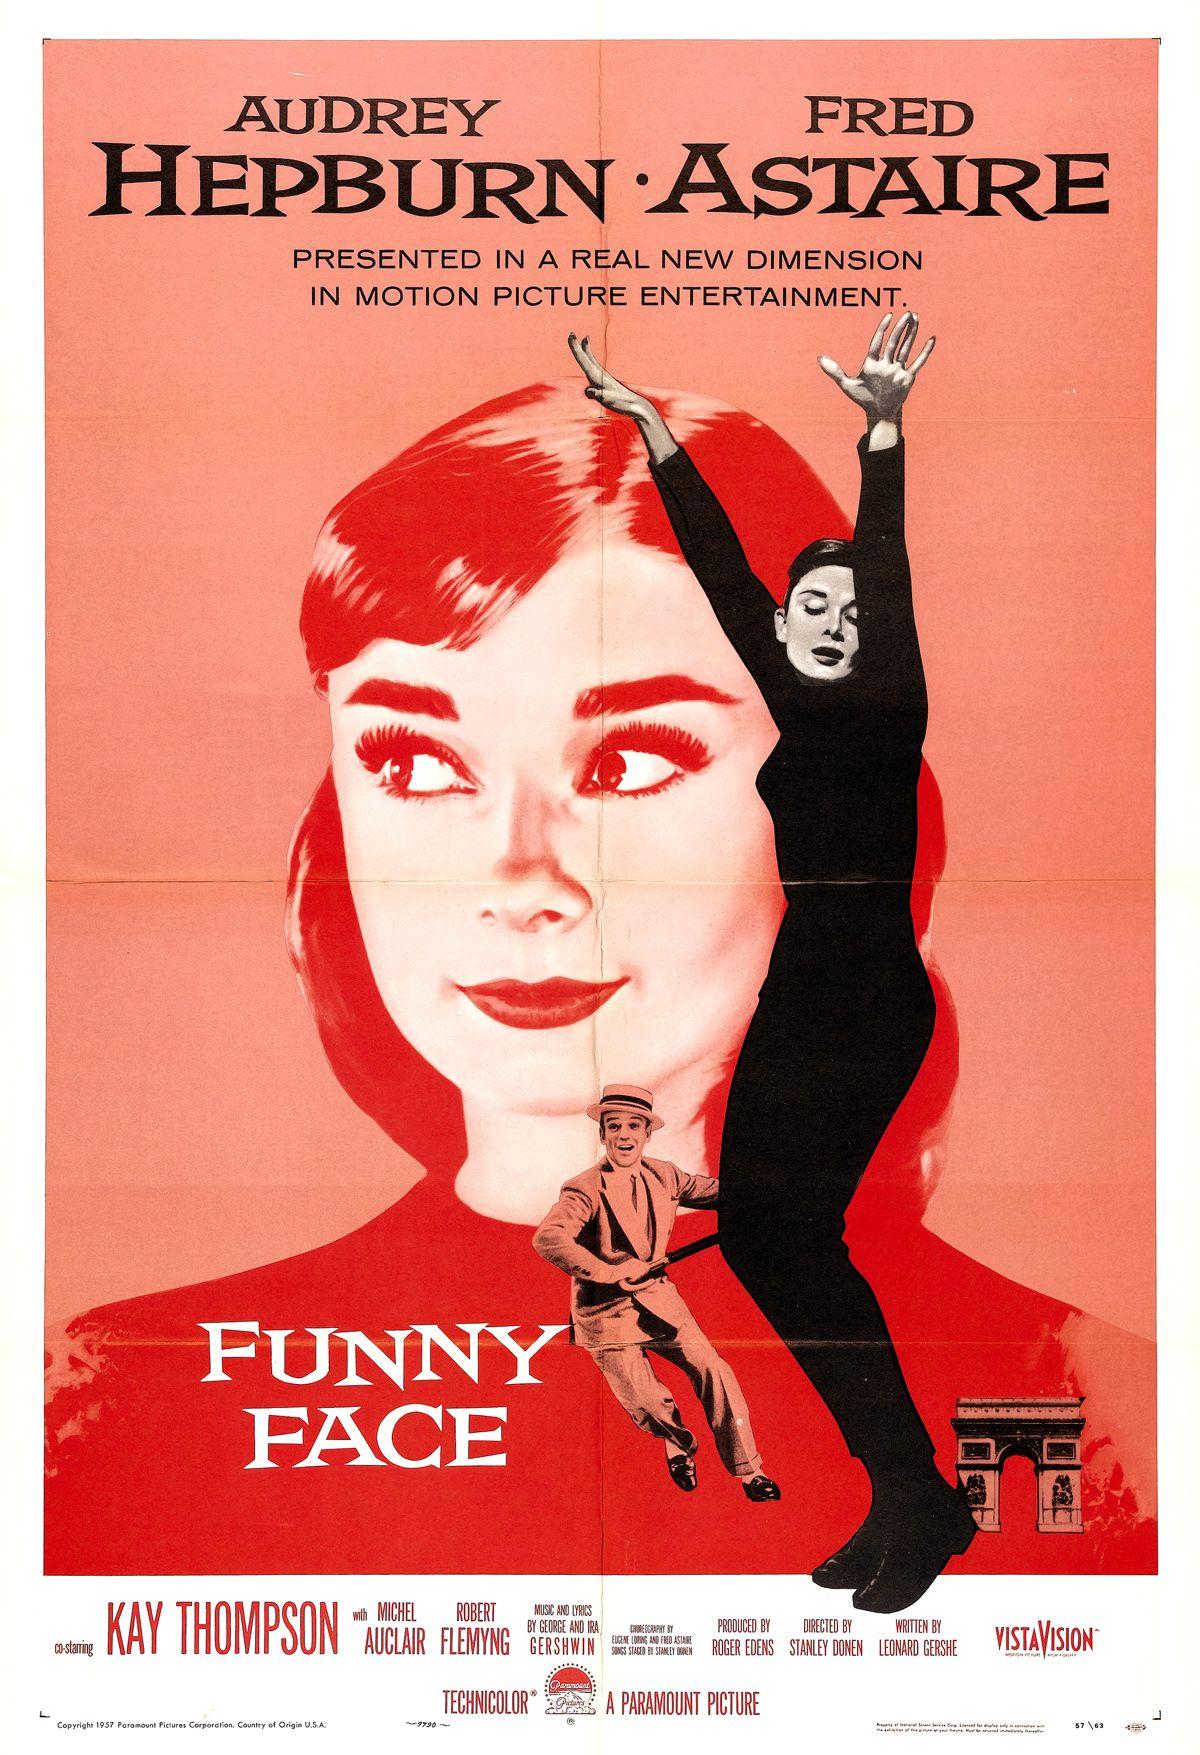 Funny Face (1-Sheet movie poster) via TCM